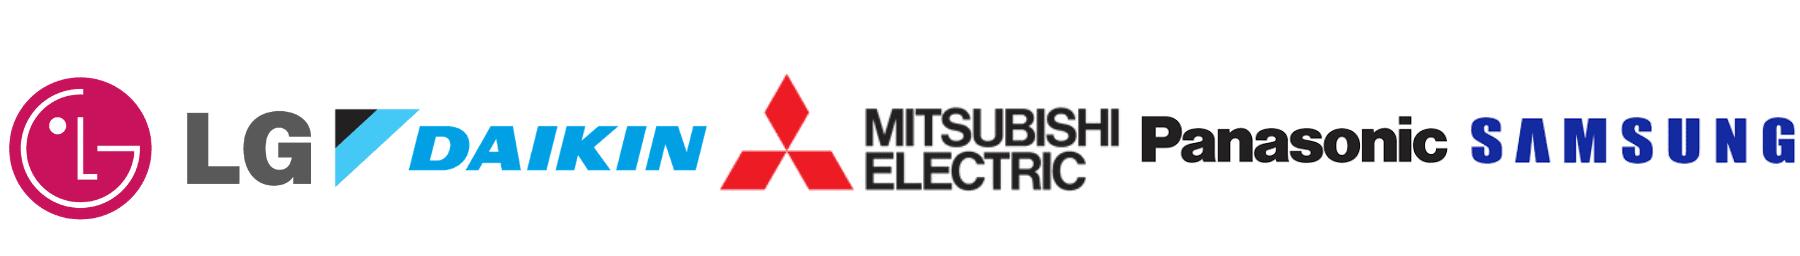 Some of the brands we install Mitsubishi Electric Panasonic Daikin LG Samsung